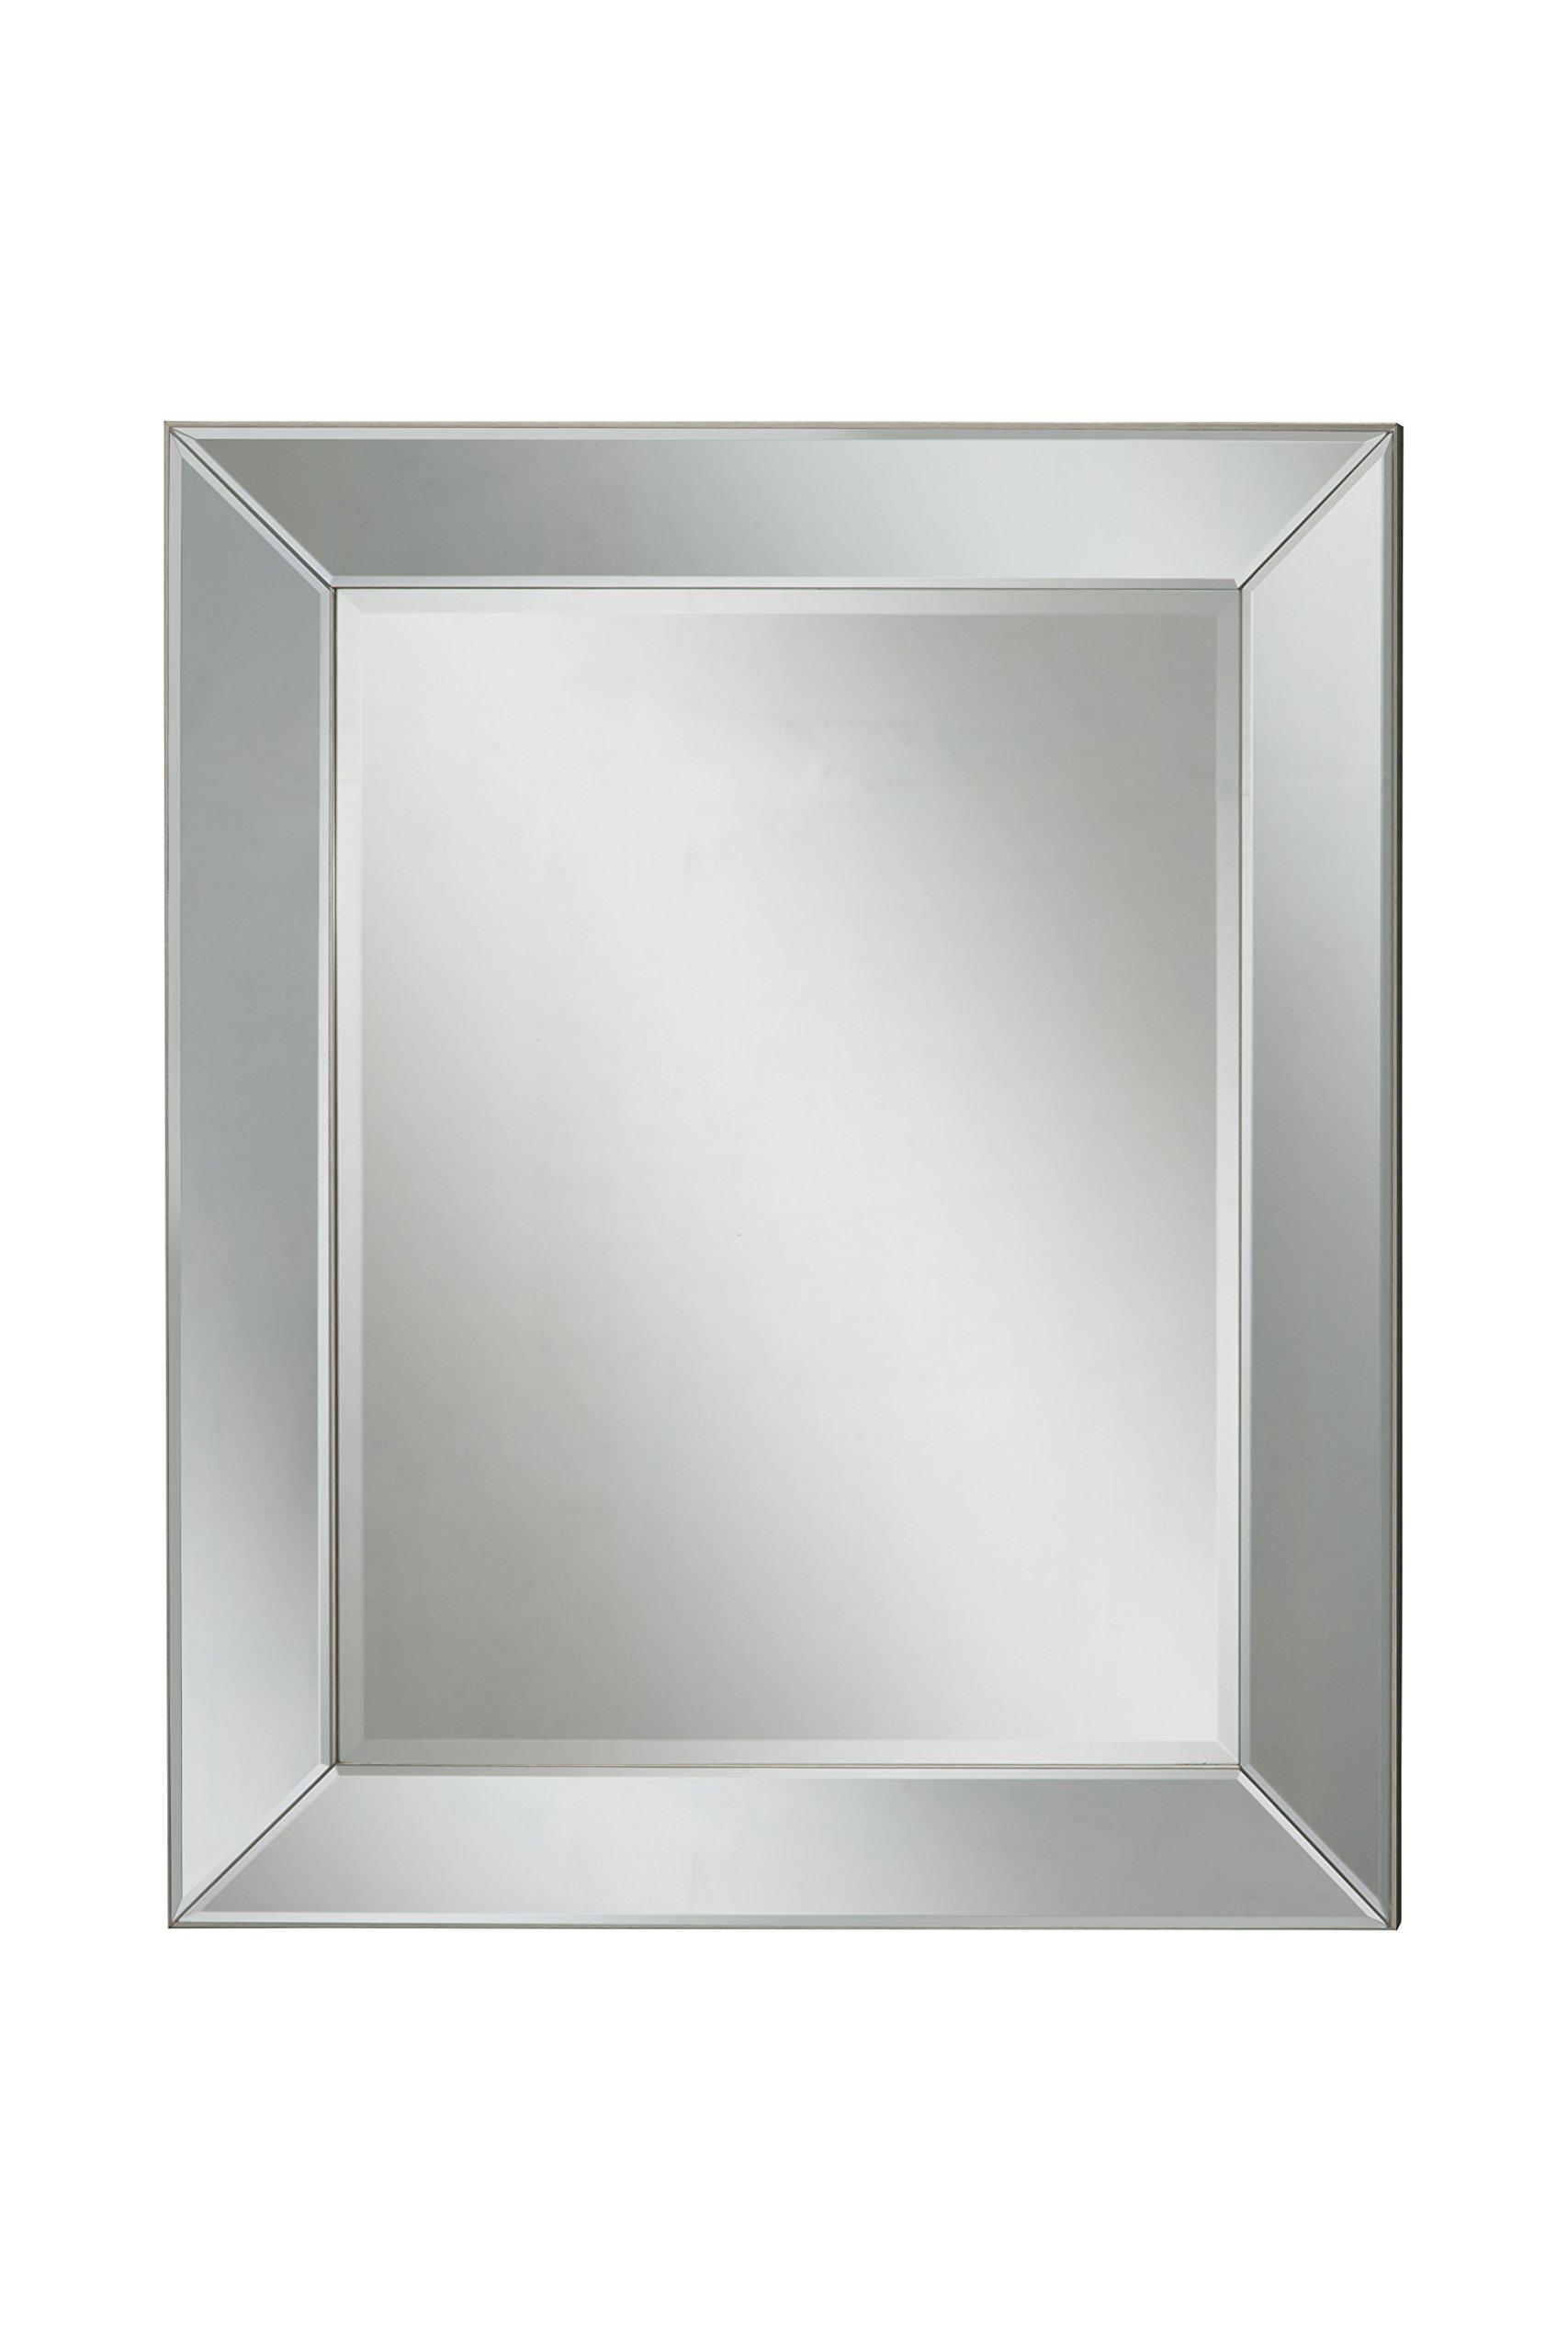 Sandberg Furniture 17017 Mirror on Mirror Wall Mirror,,36 X 30''